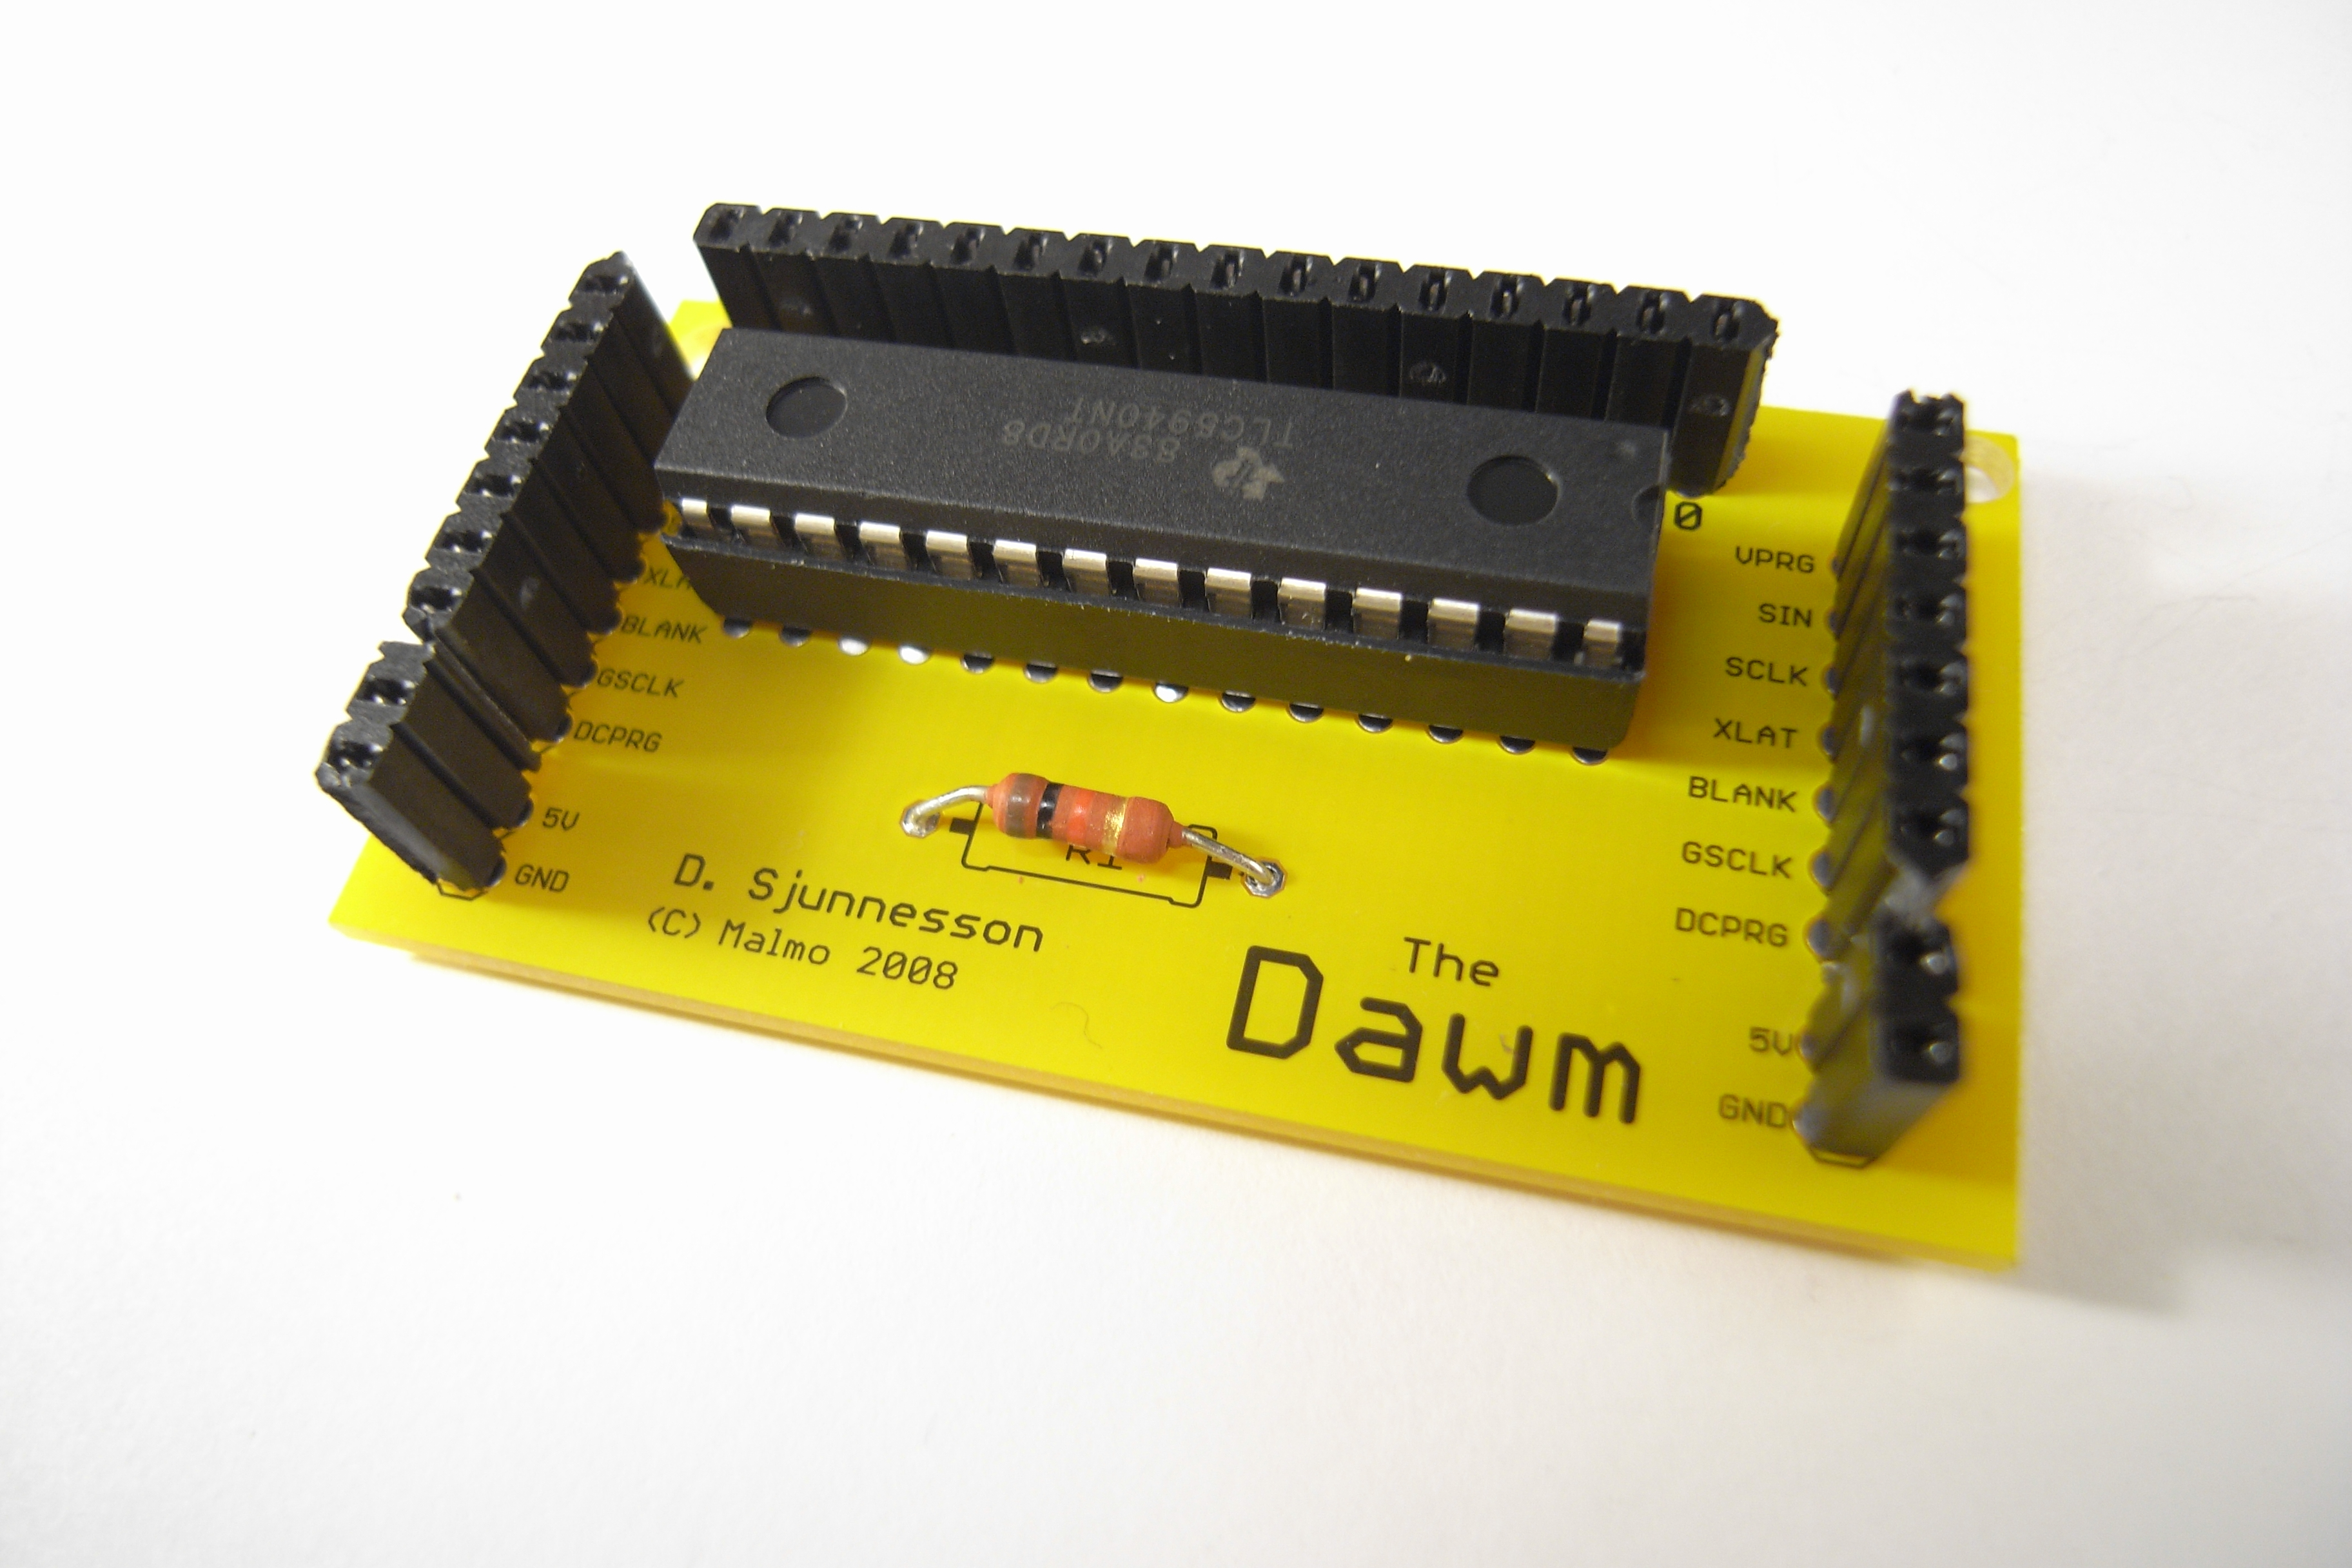 The Dawm